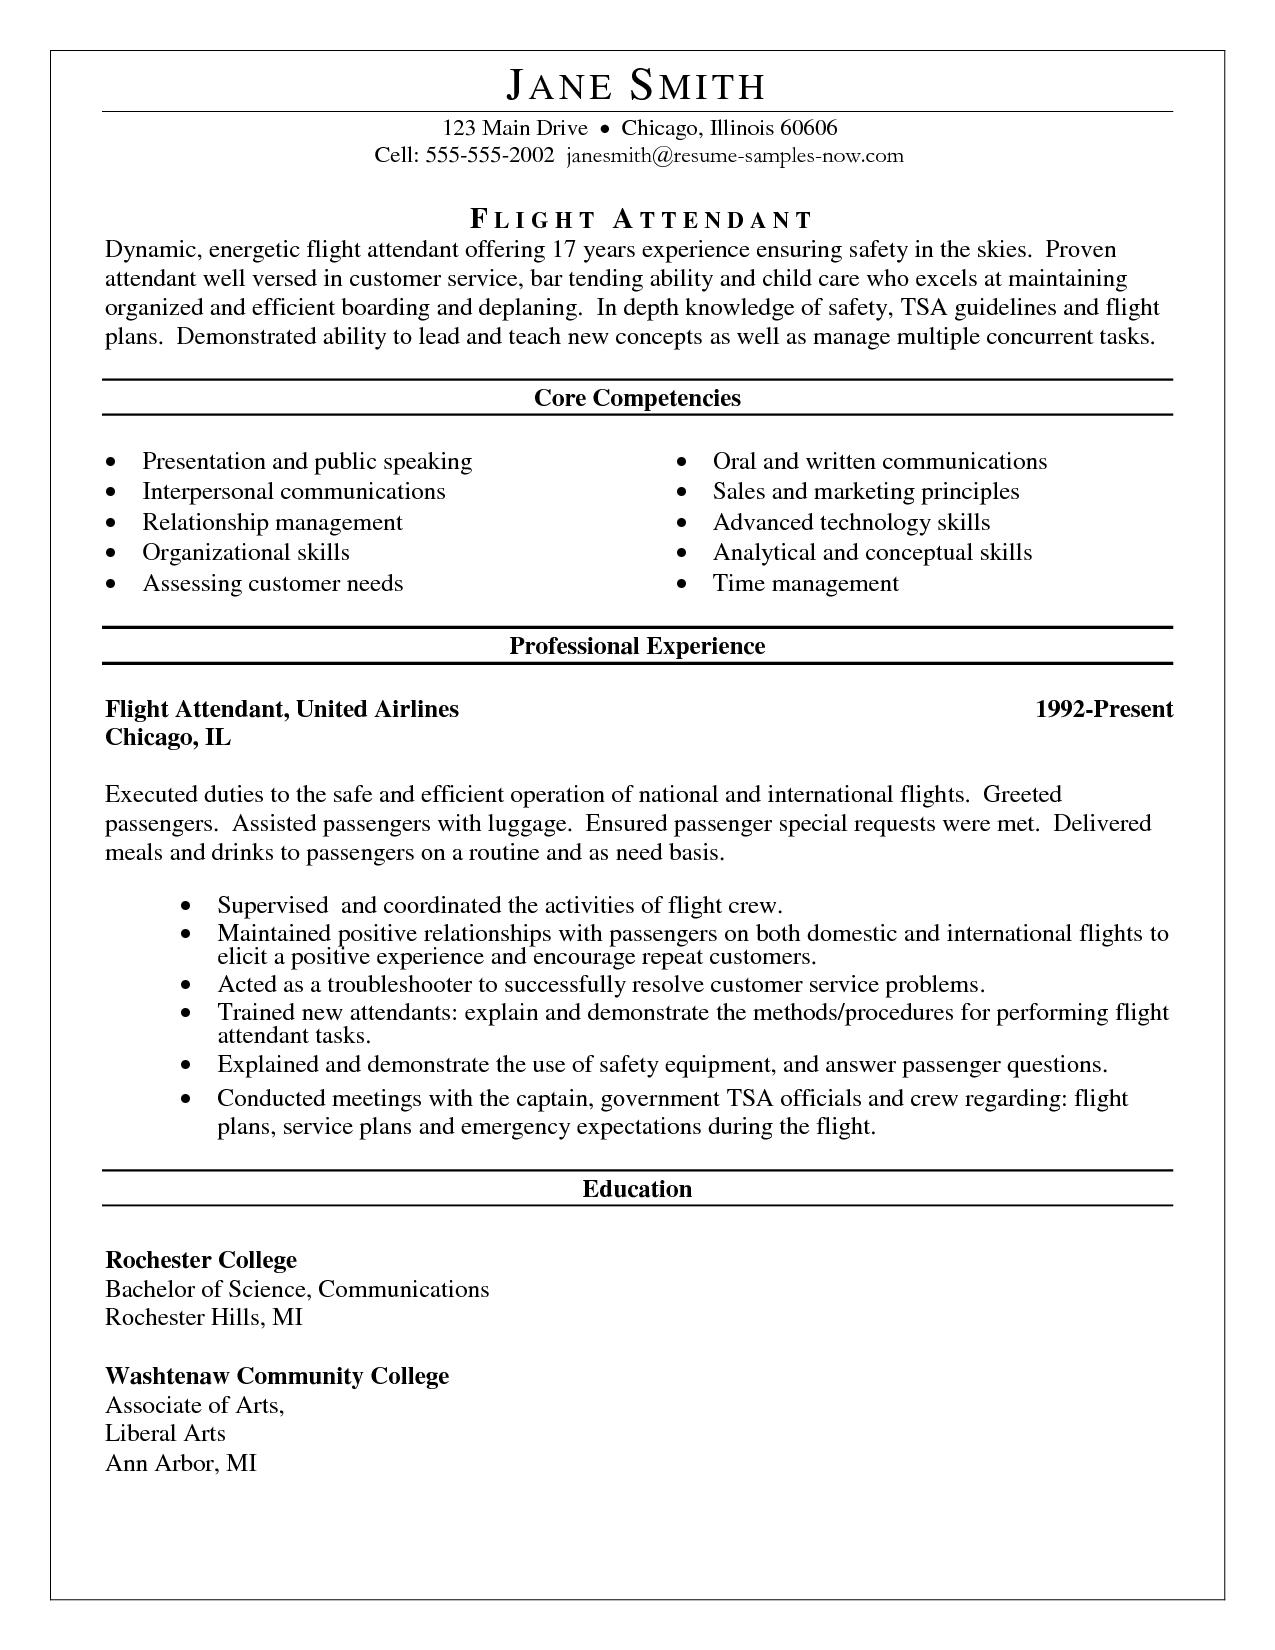 Core Competencies Resume